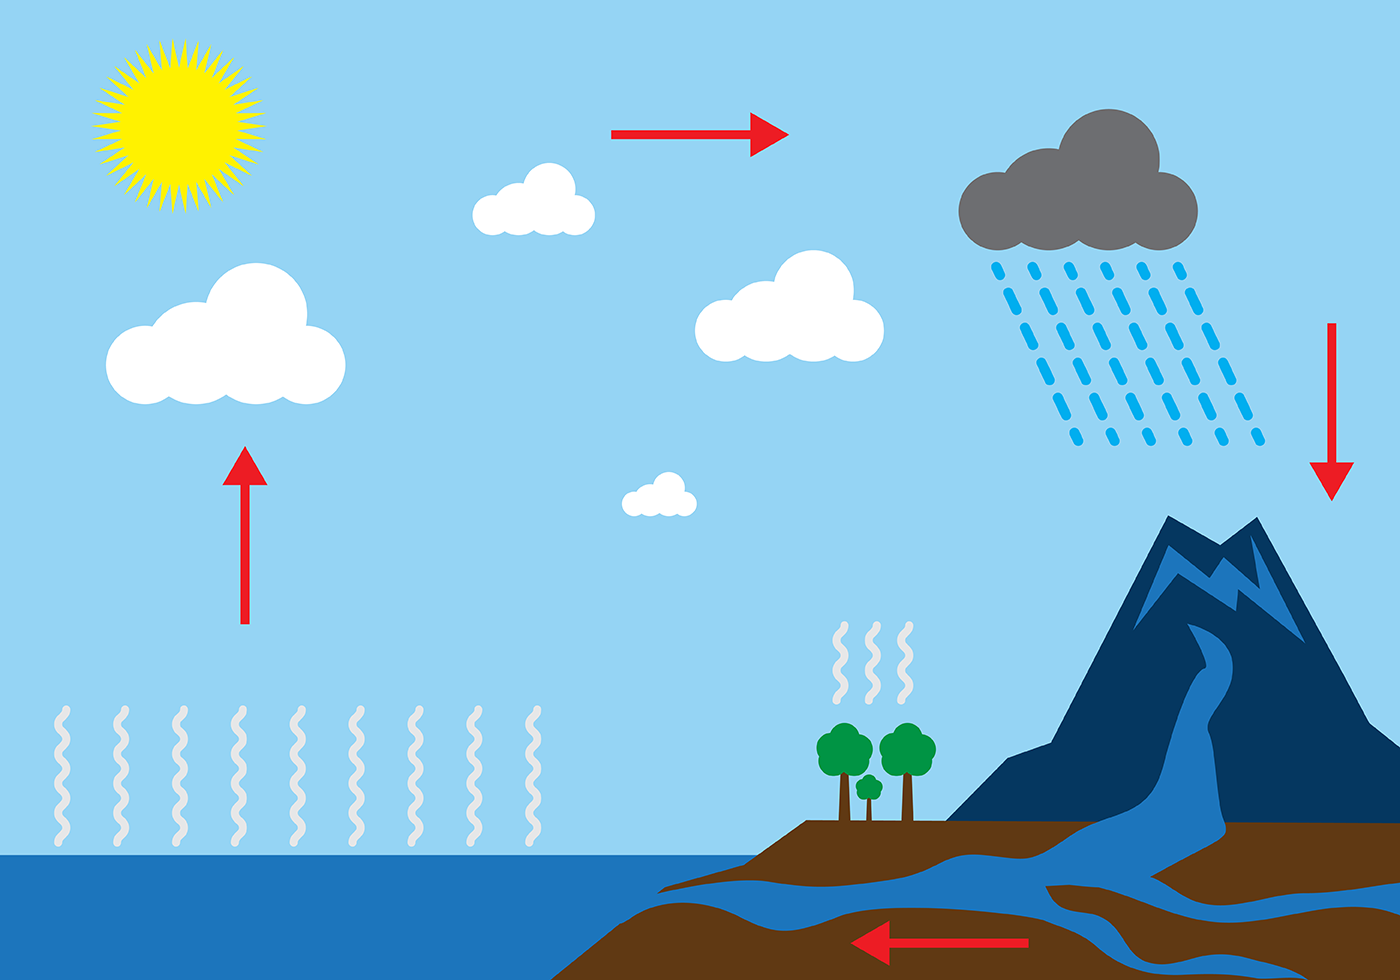 1400x980 Water Cycle Diagram Free Vector Art